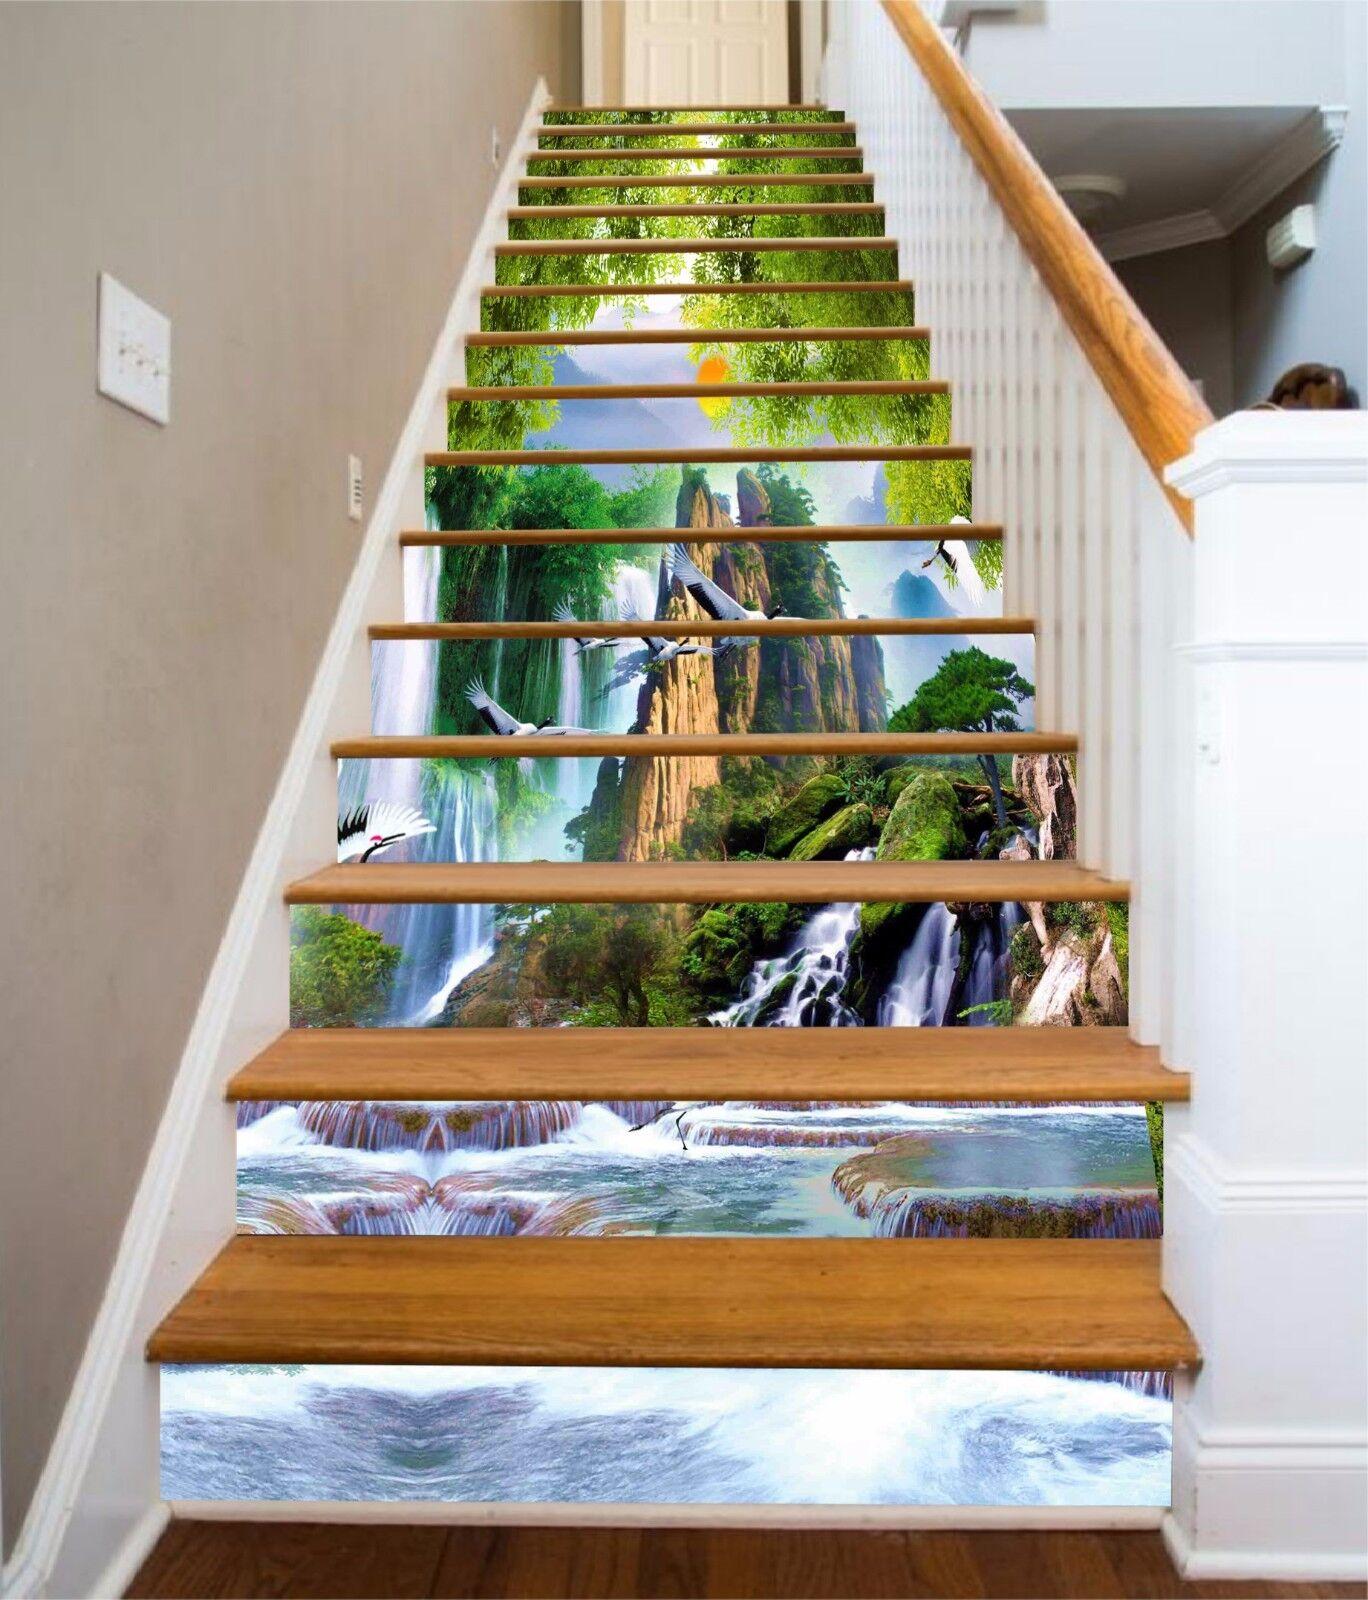 3D Birds Waterfalls Stair Risers Decoration Photo Mural Vinyl Decal Wallpaper UK